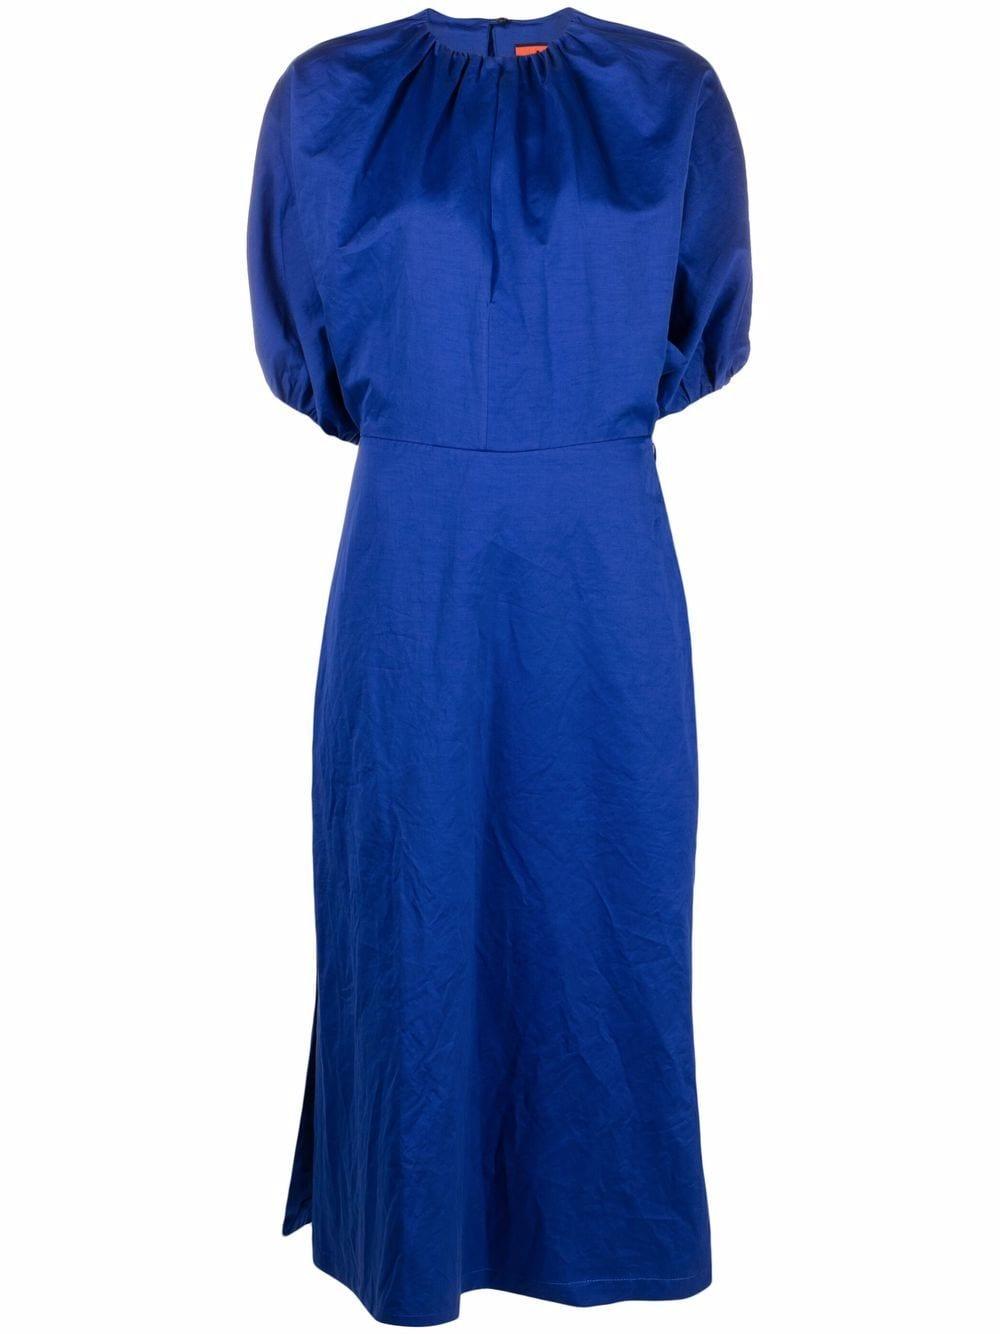 COLVILLE | Dress | CVS21532BLUBLUE